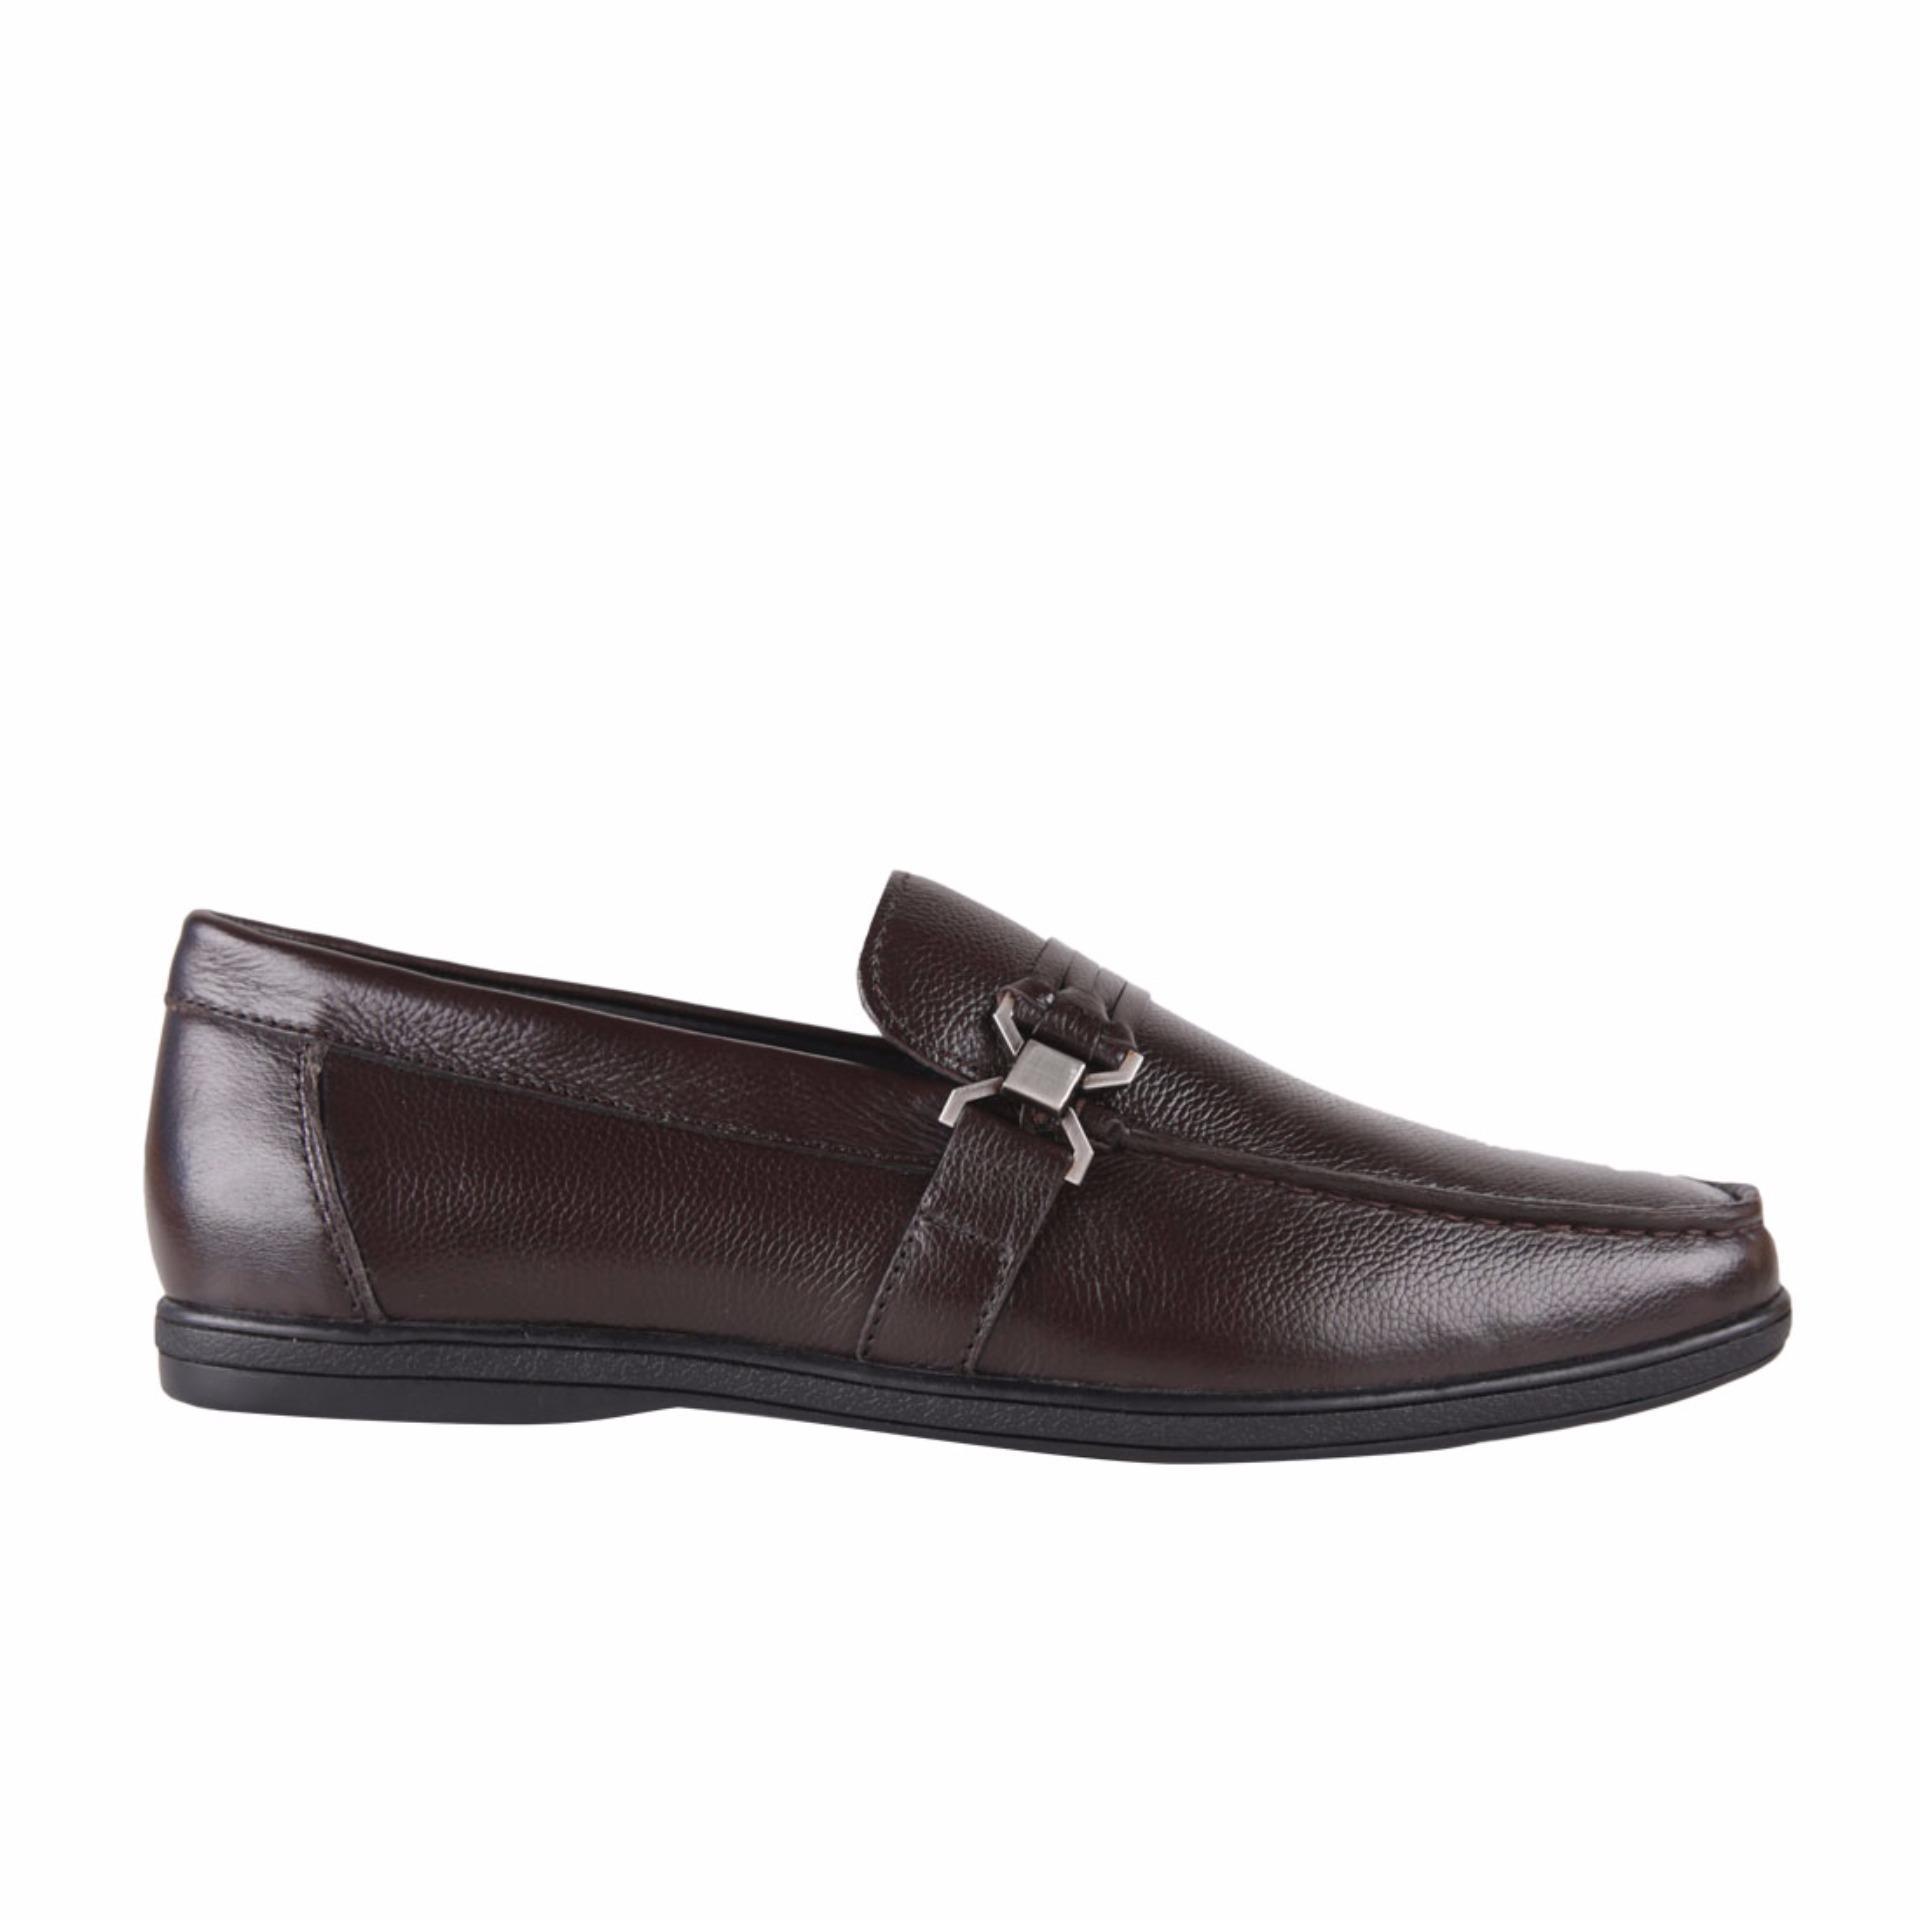 Obermain Sepatu Kasual Pria Gino - Slip On 1